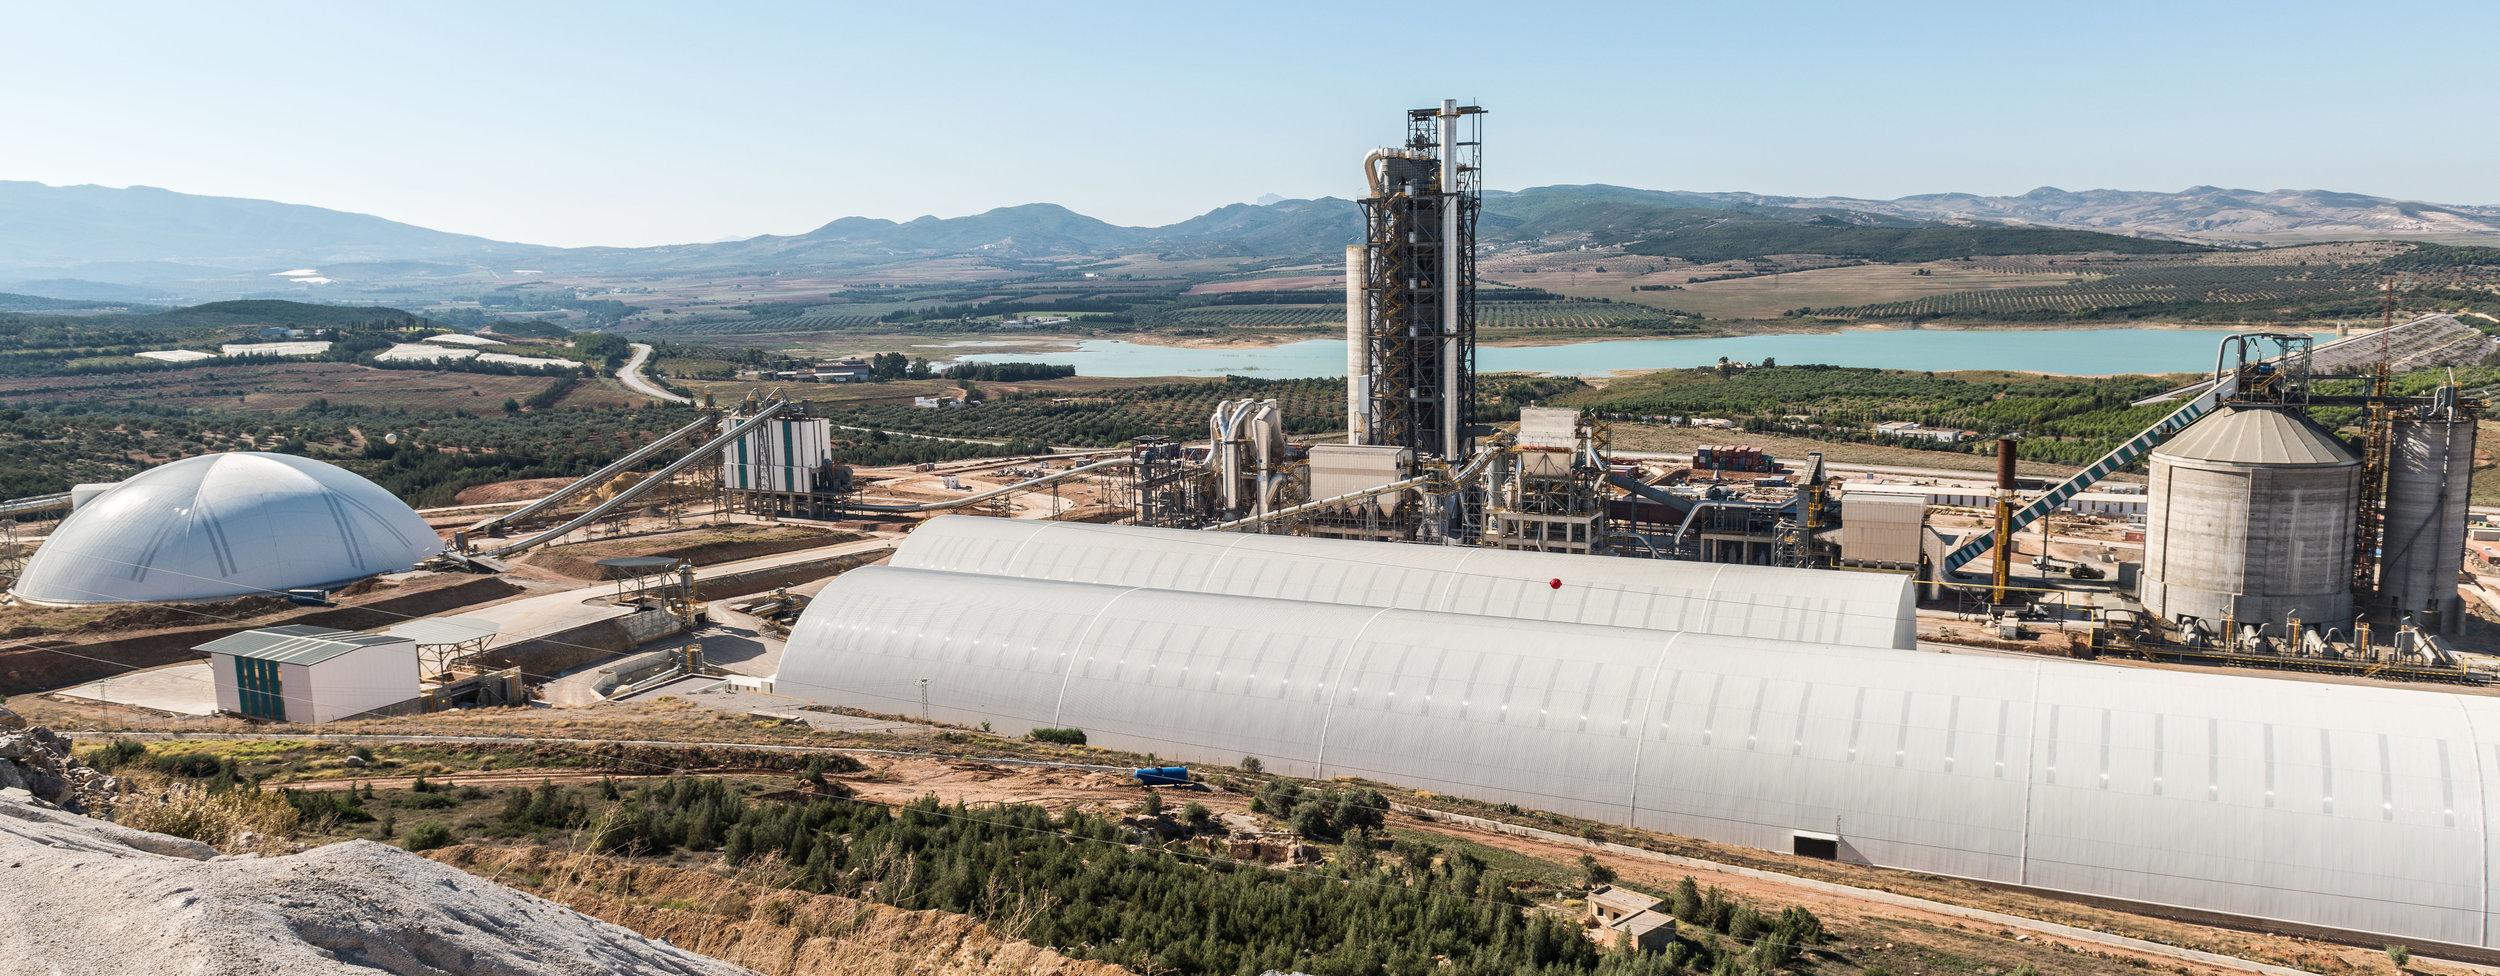 Cement plant with three Geometrica domes, Tunisia